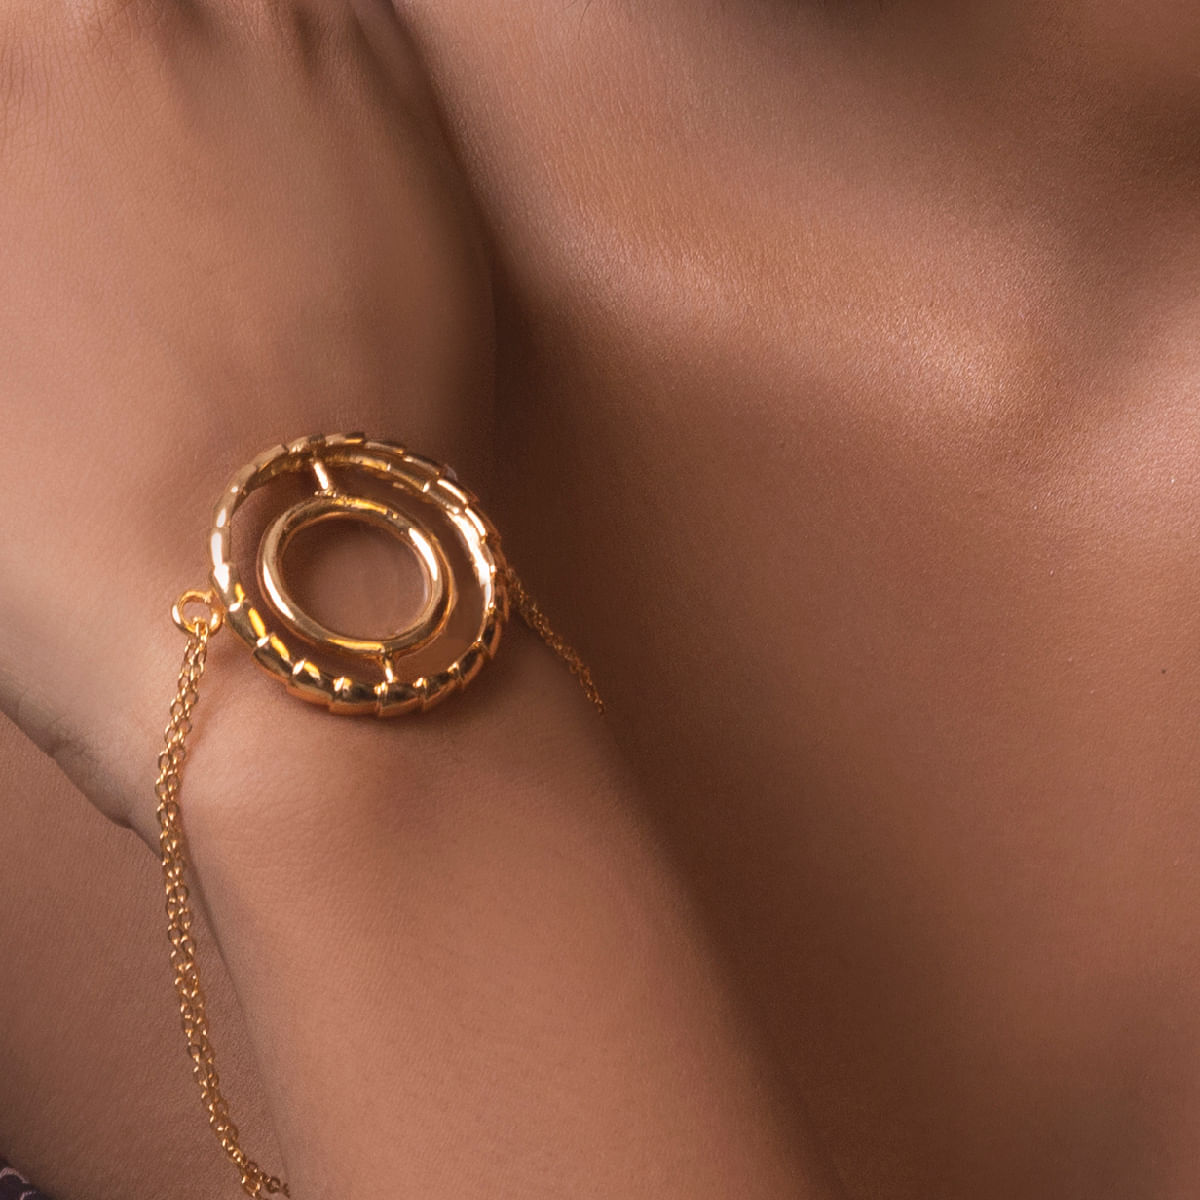 Concentric Circle 22Kt Gold Plated Bracelet